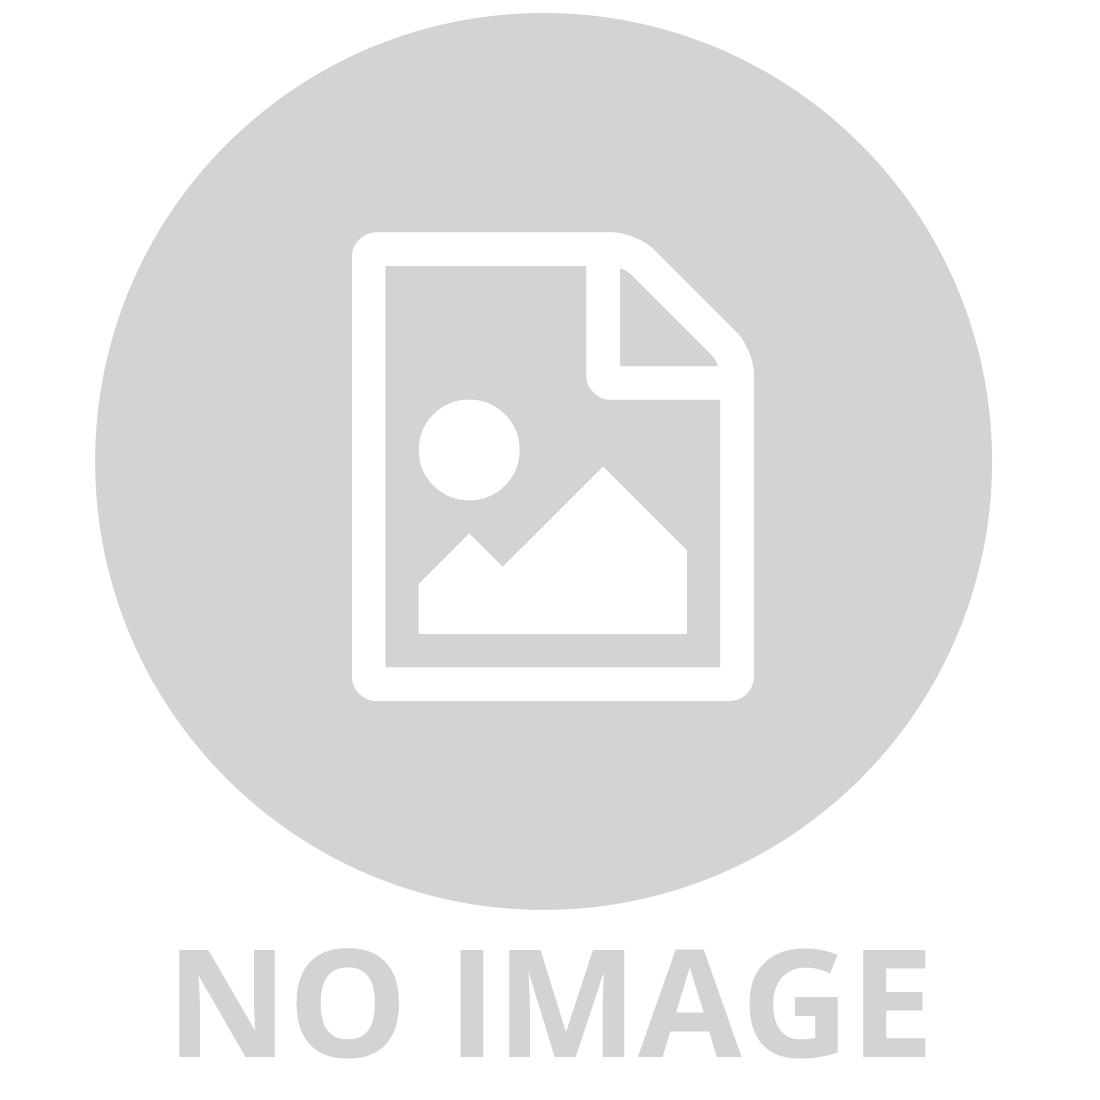 RAVENSBURGER- MERMAID TALES PUZZLE 60PC